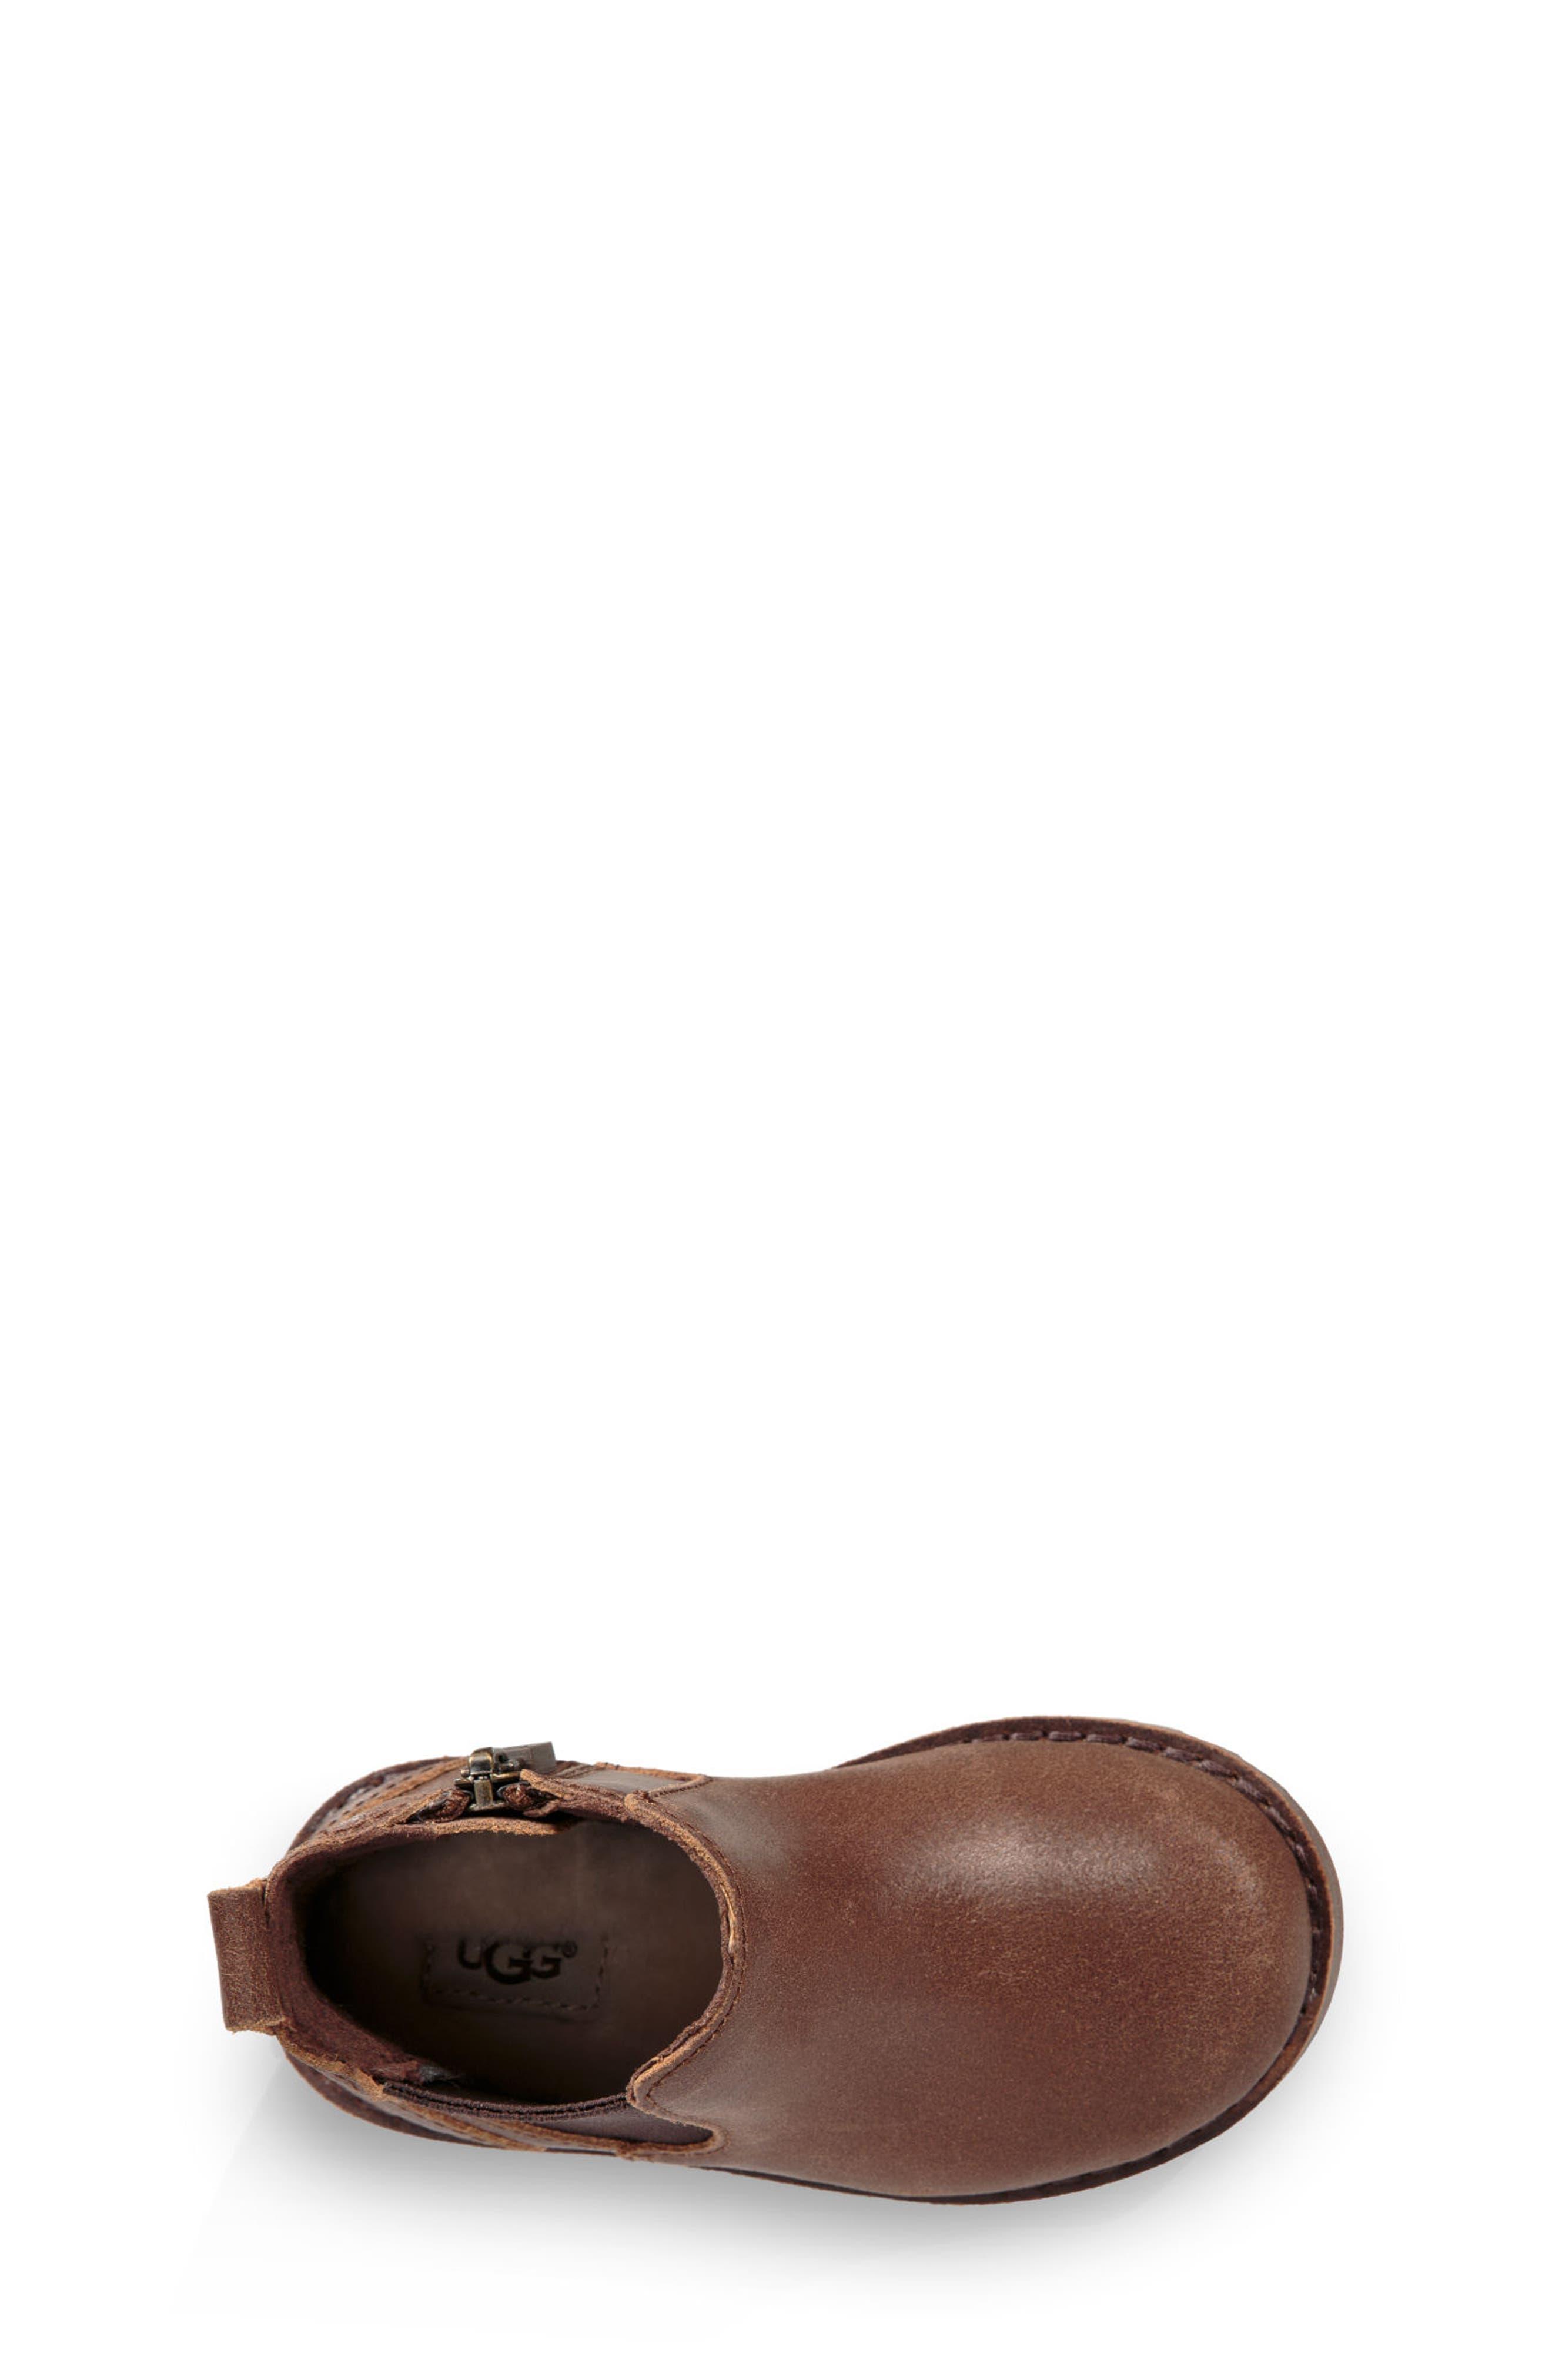 Callum Water Resistant Chelsea Boot,                             Alternate thumbnail 3, color,                             Chocolate Brown